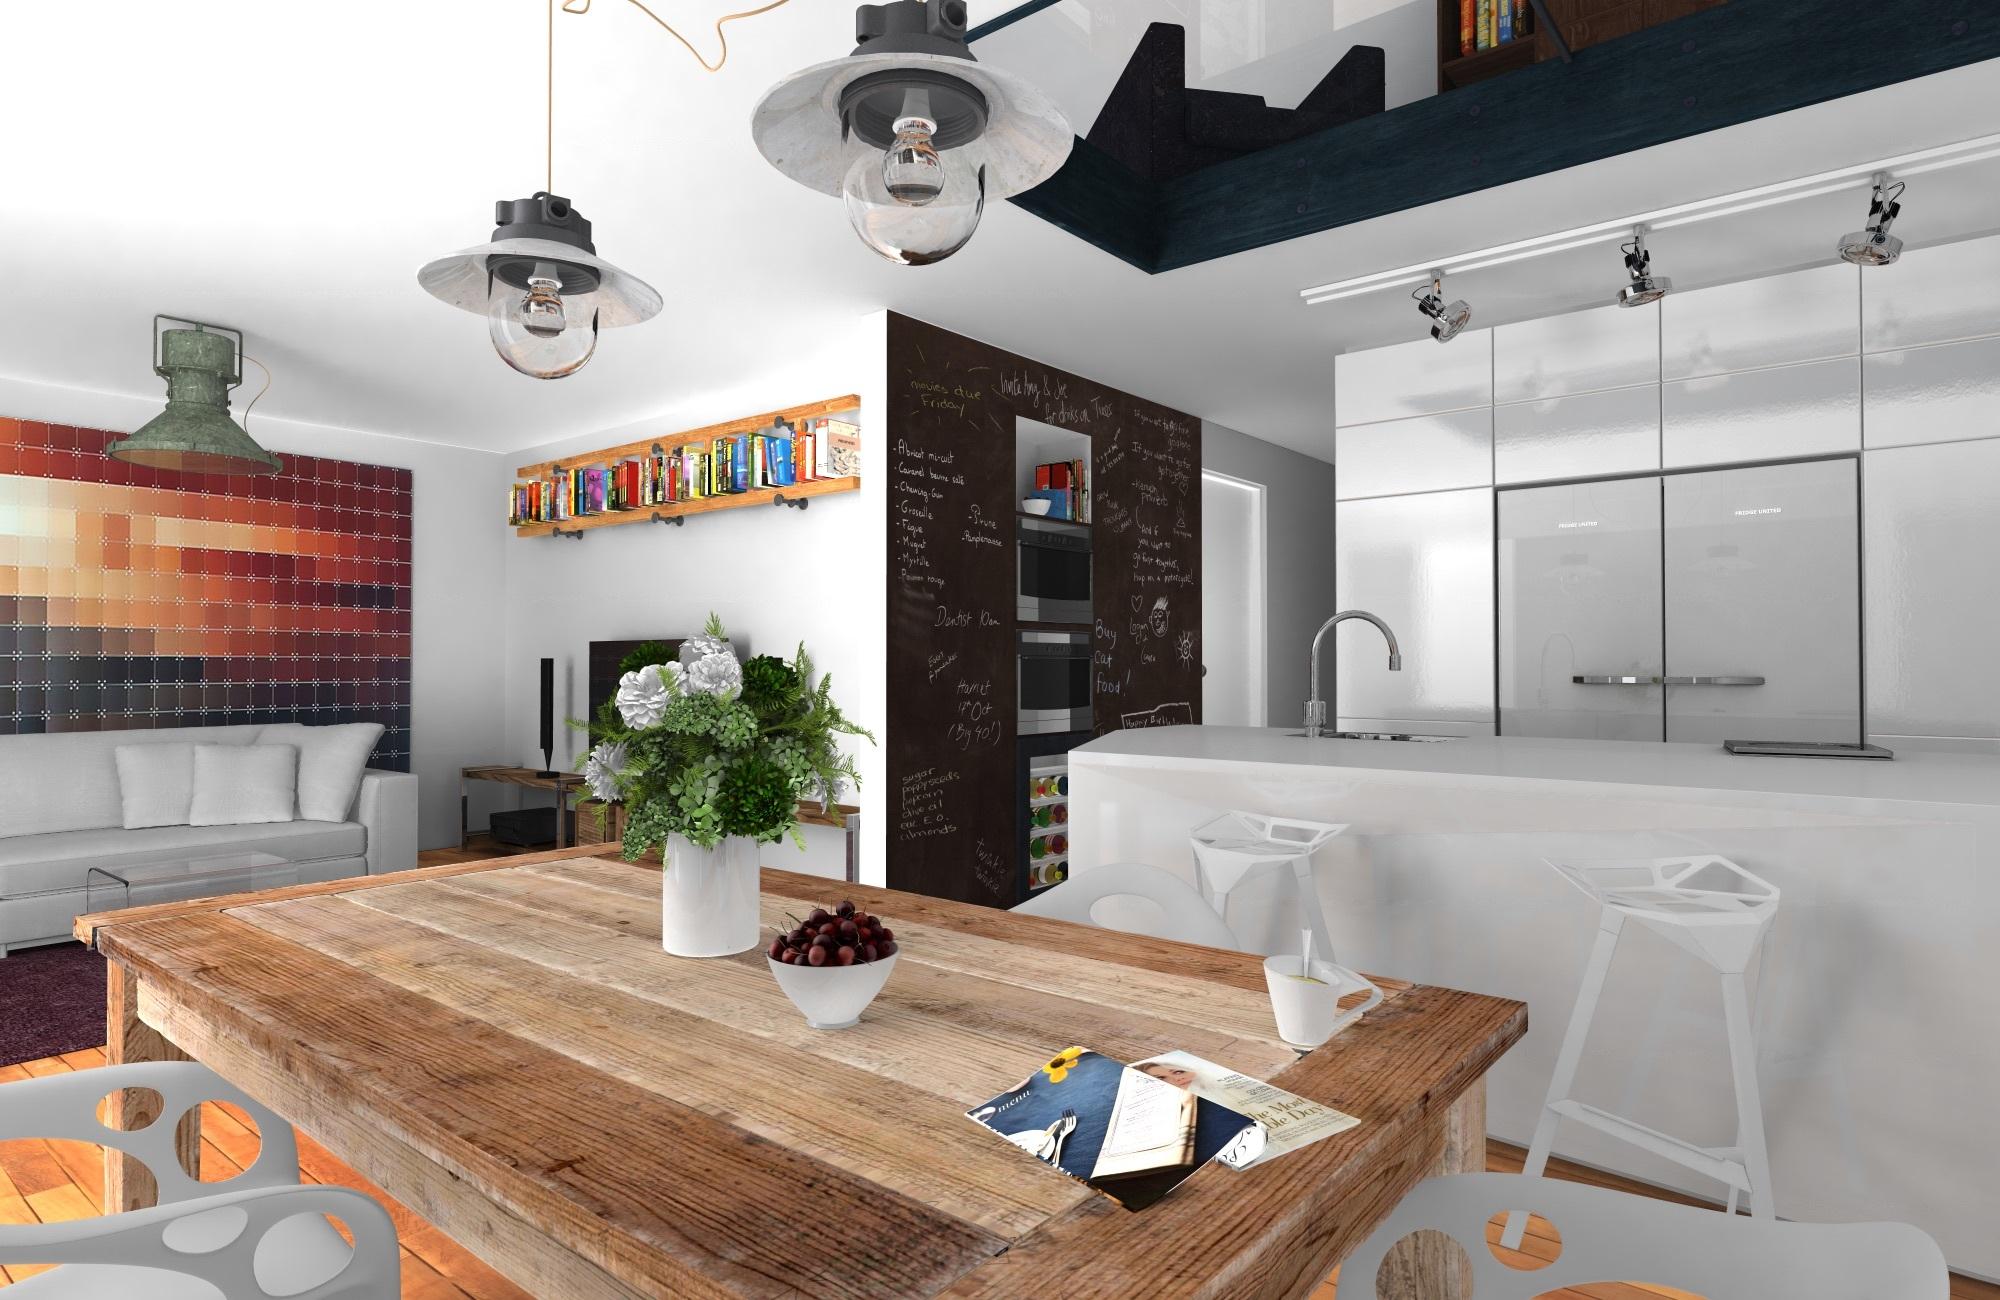 barnabythebear-kitchen-1-1db4c362-xhag.j